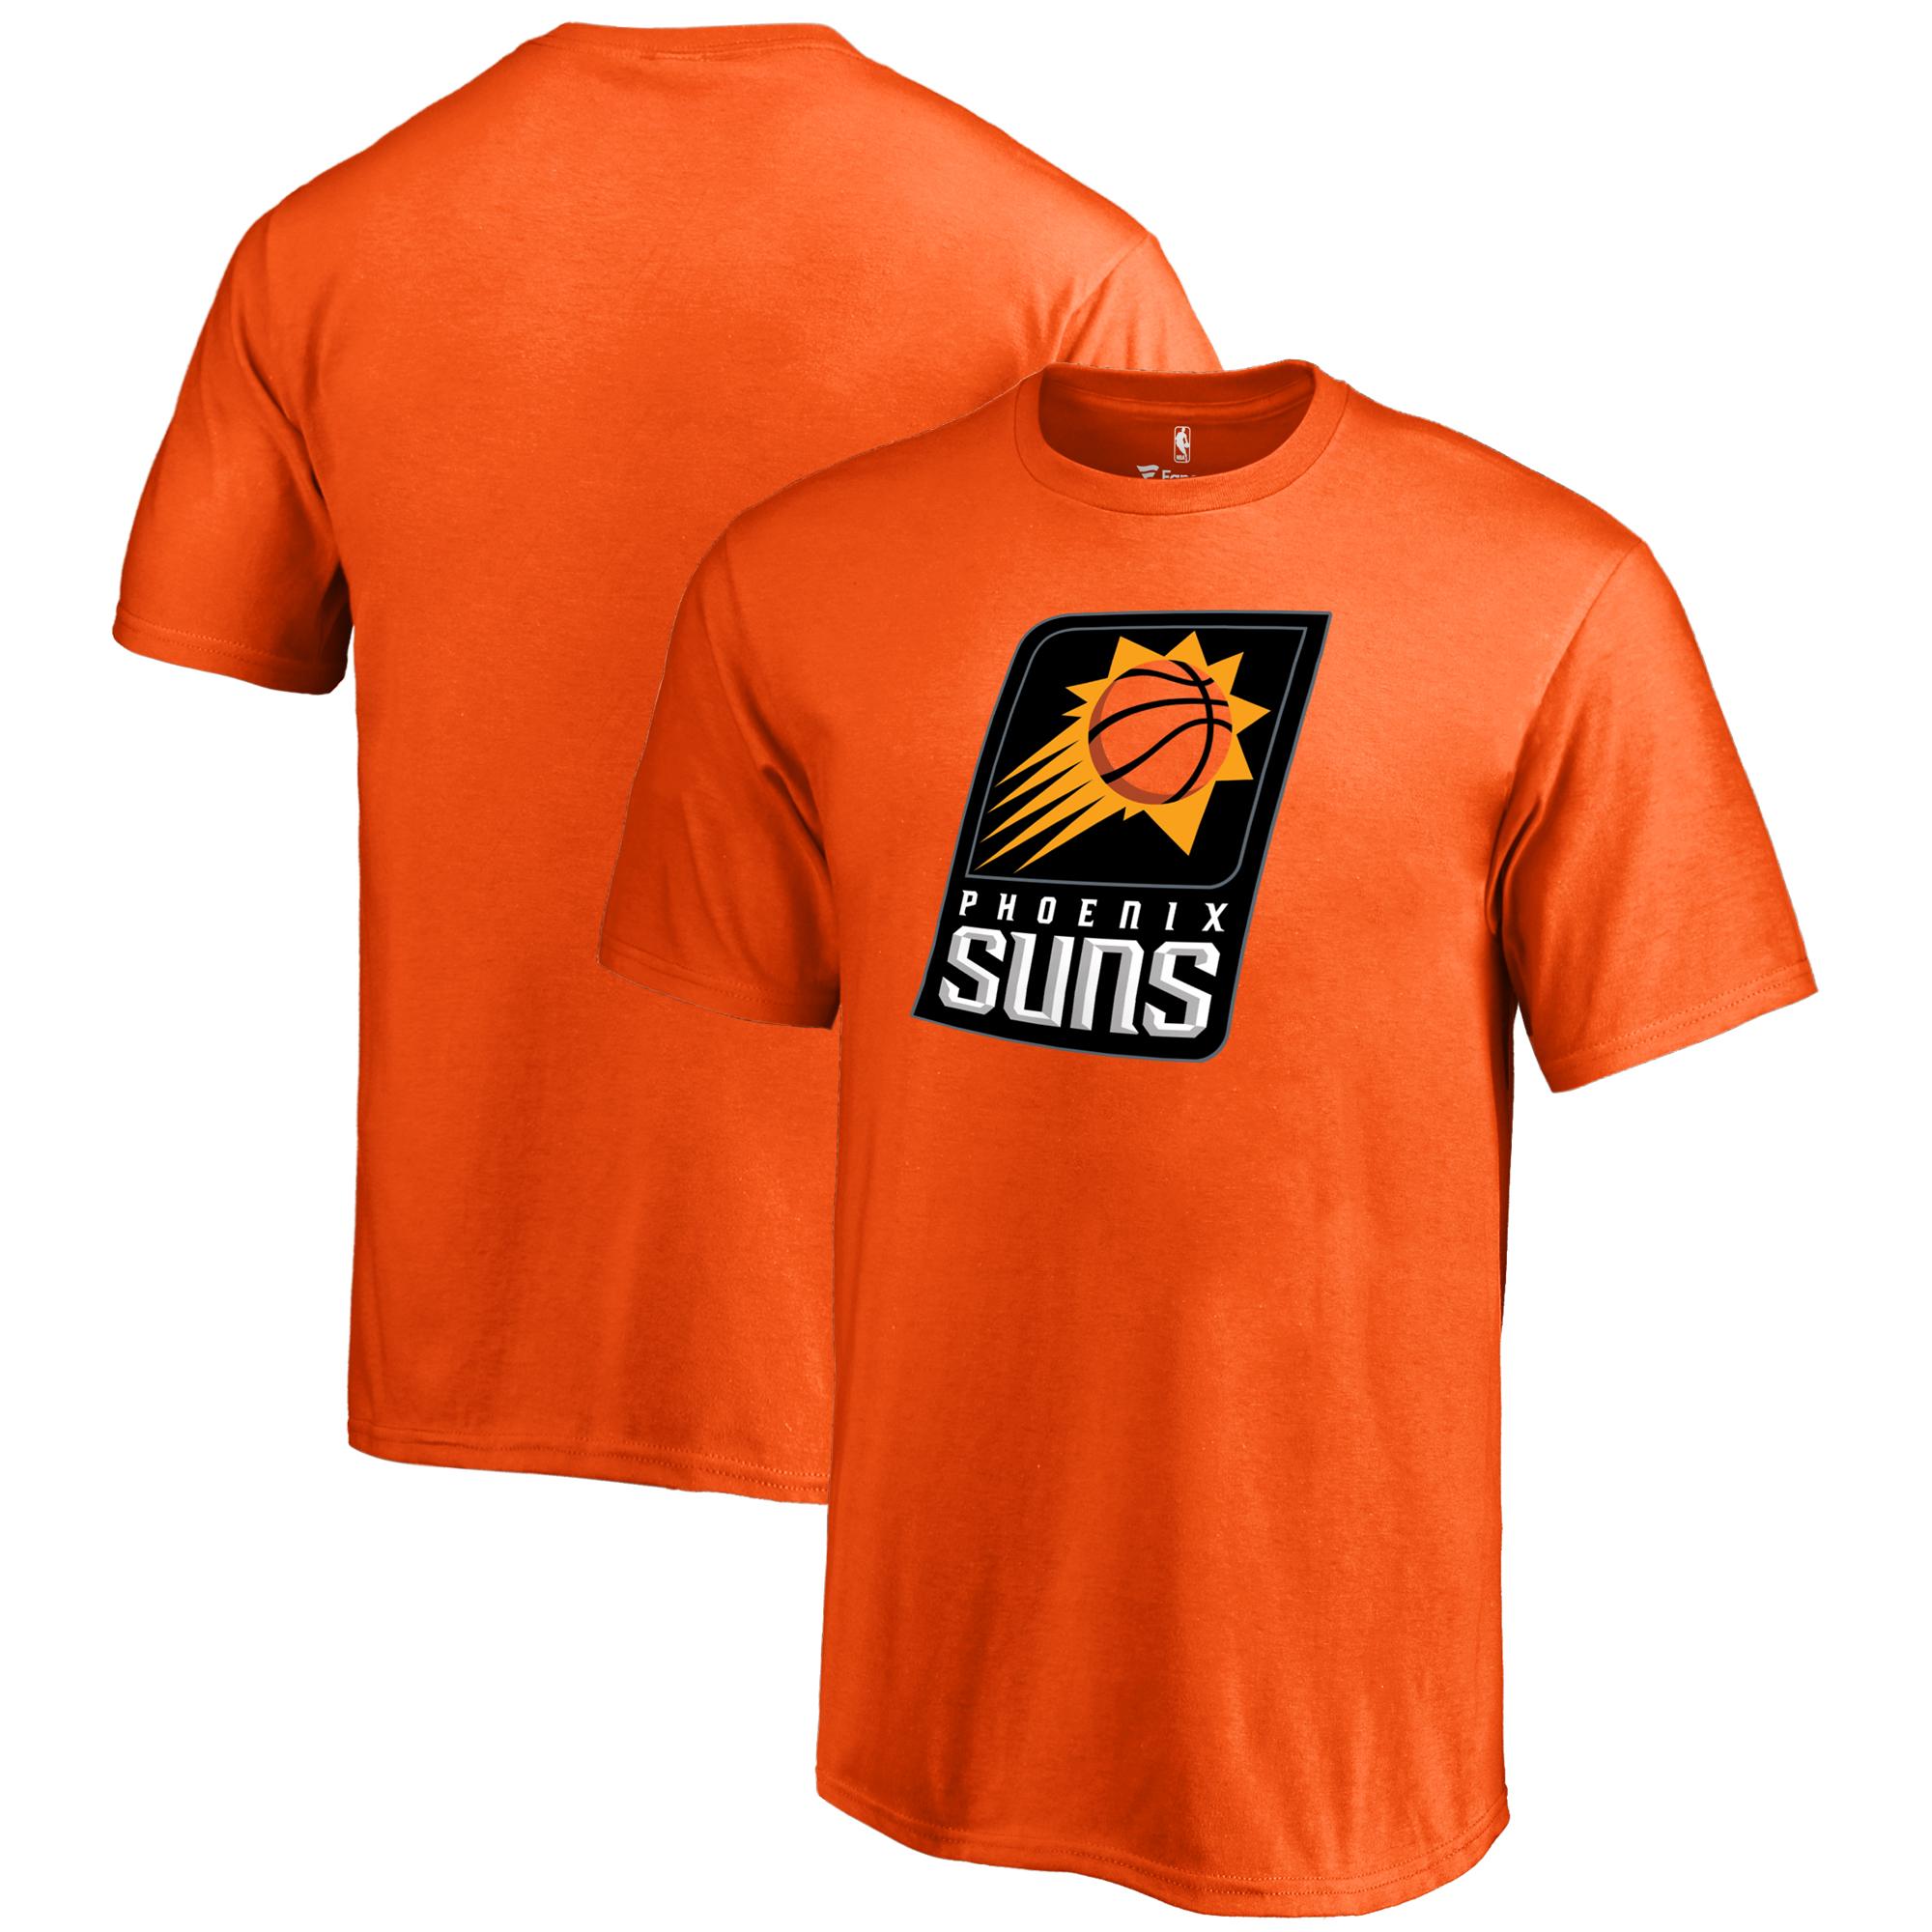 Phoenix Suns Fanatics Branded Youth Primary Logo T-Shirt - Orange